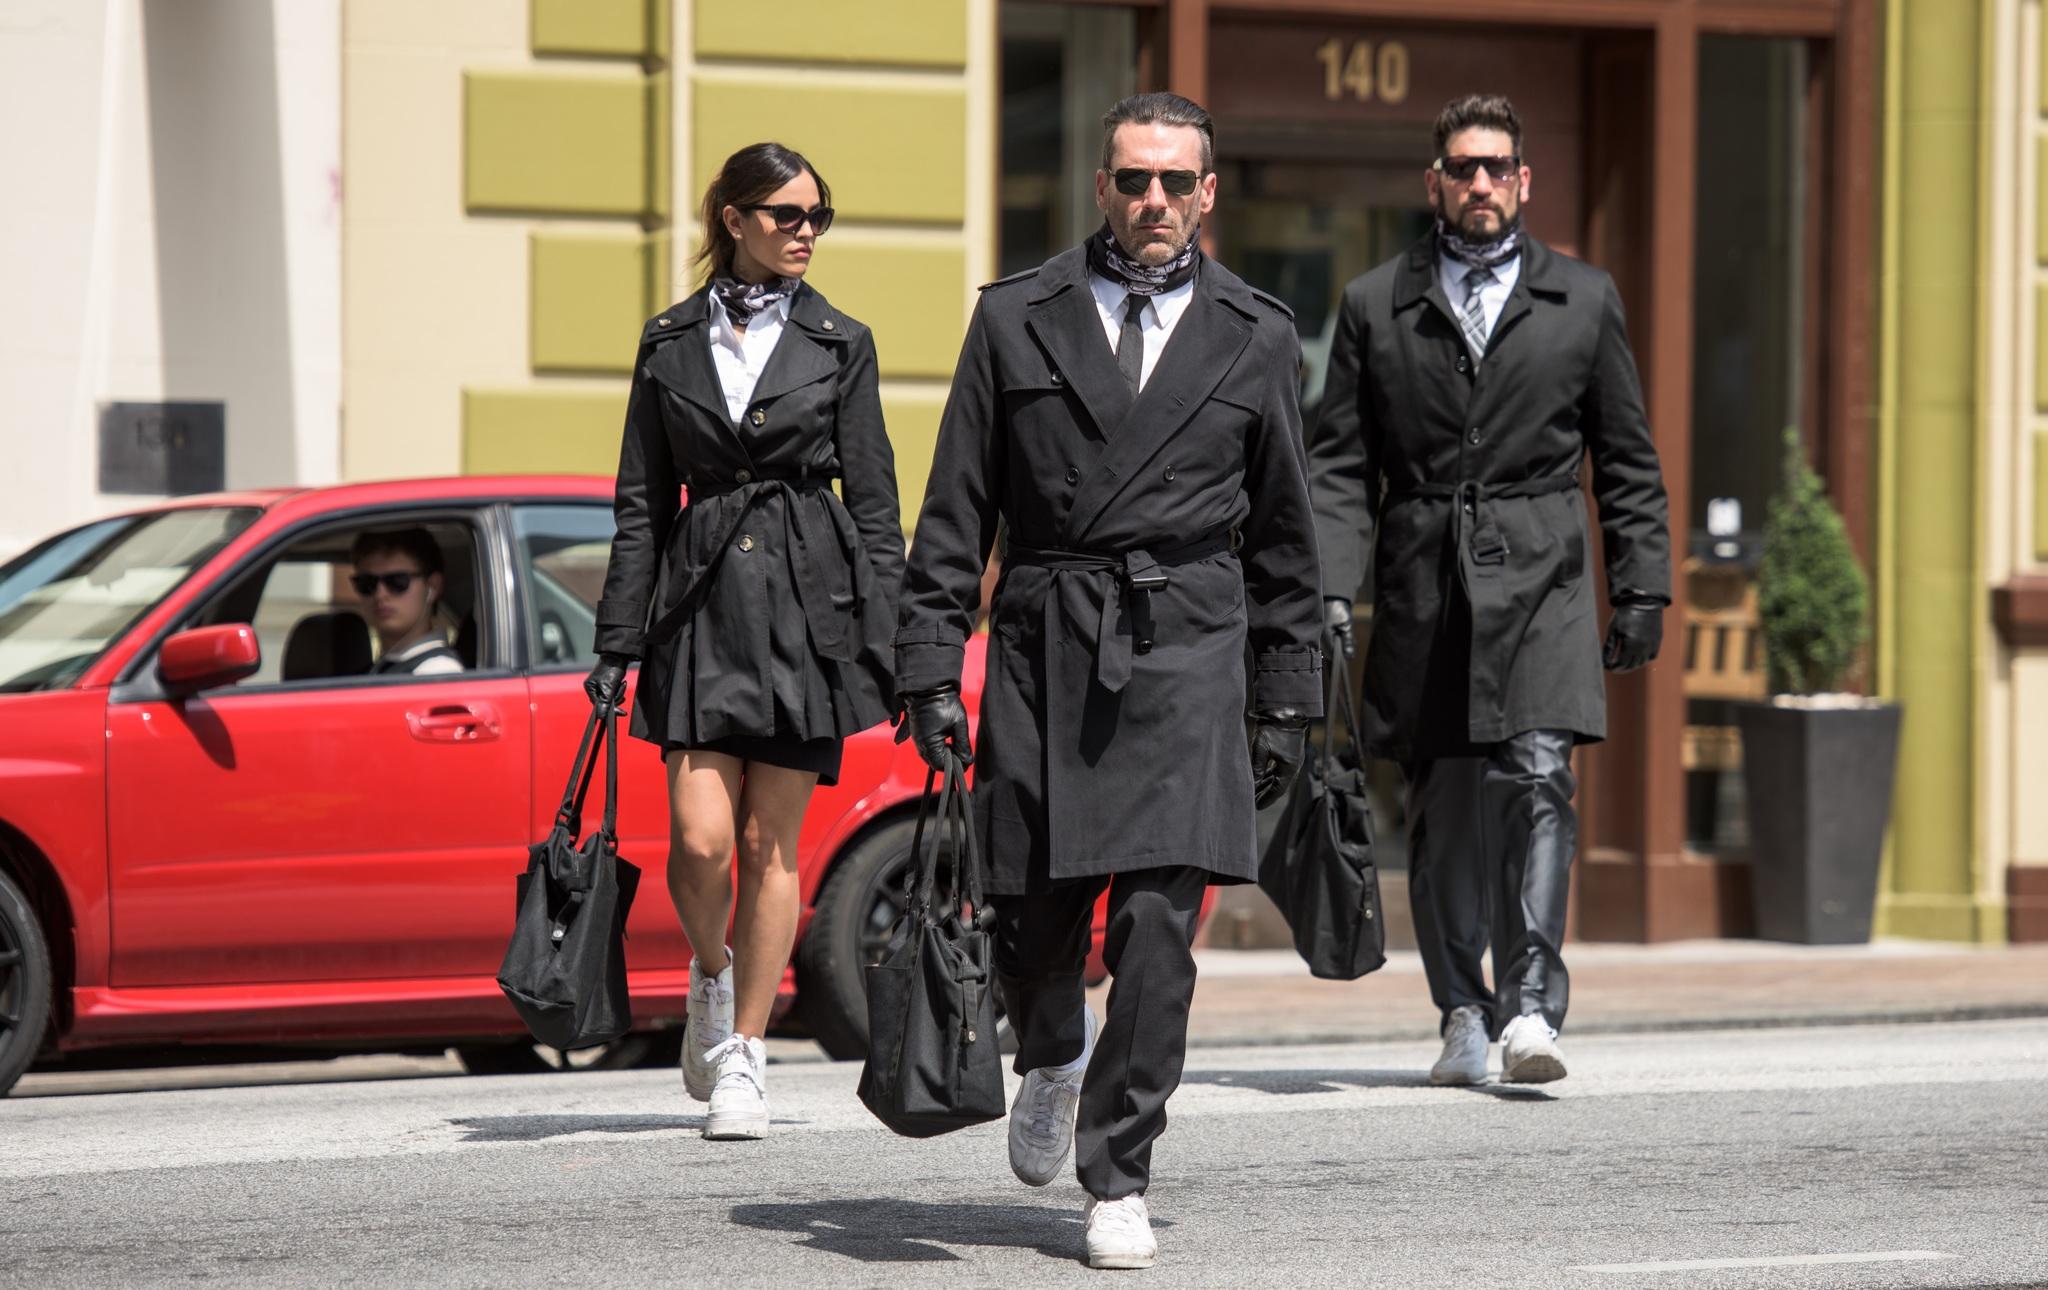 Jon Hamm, Jon Bernthal, Eiza González, and Ansel Elgort in Baby Driver (2017)